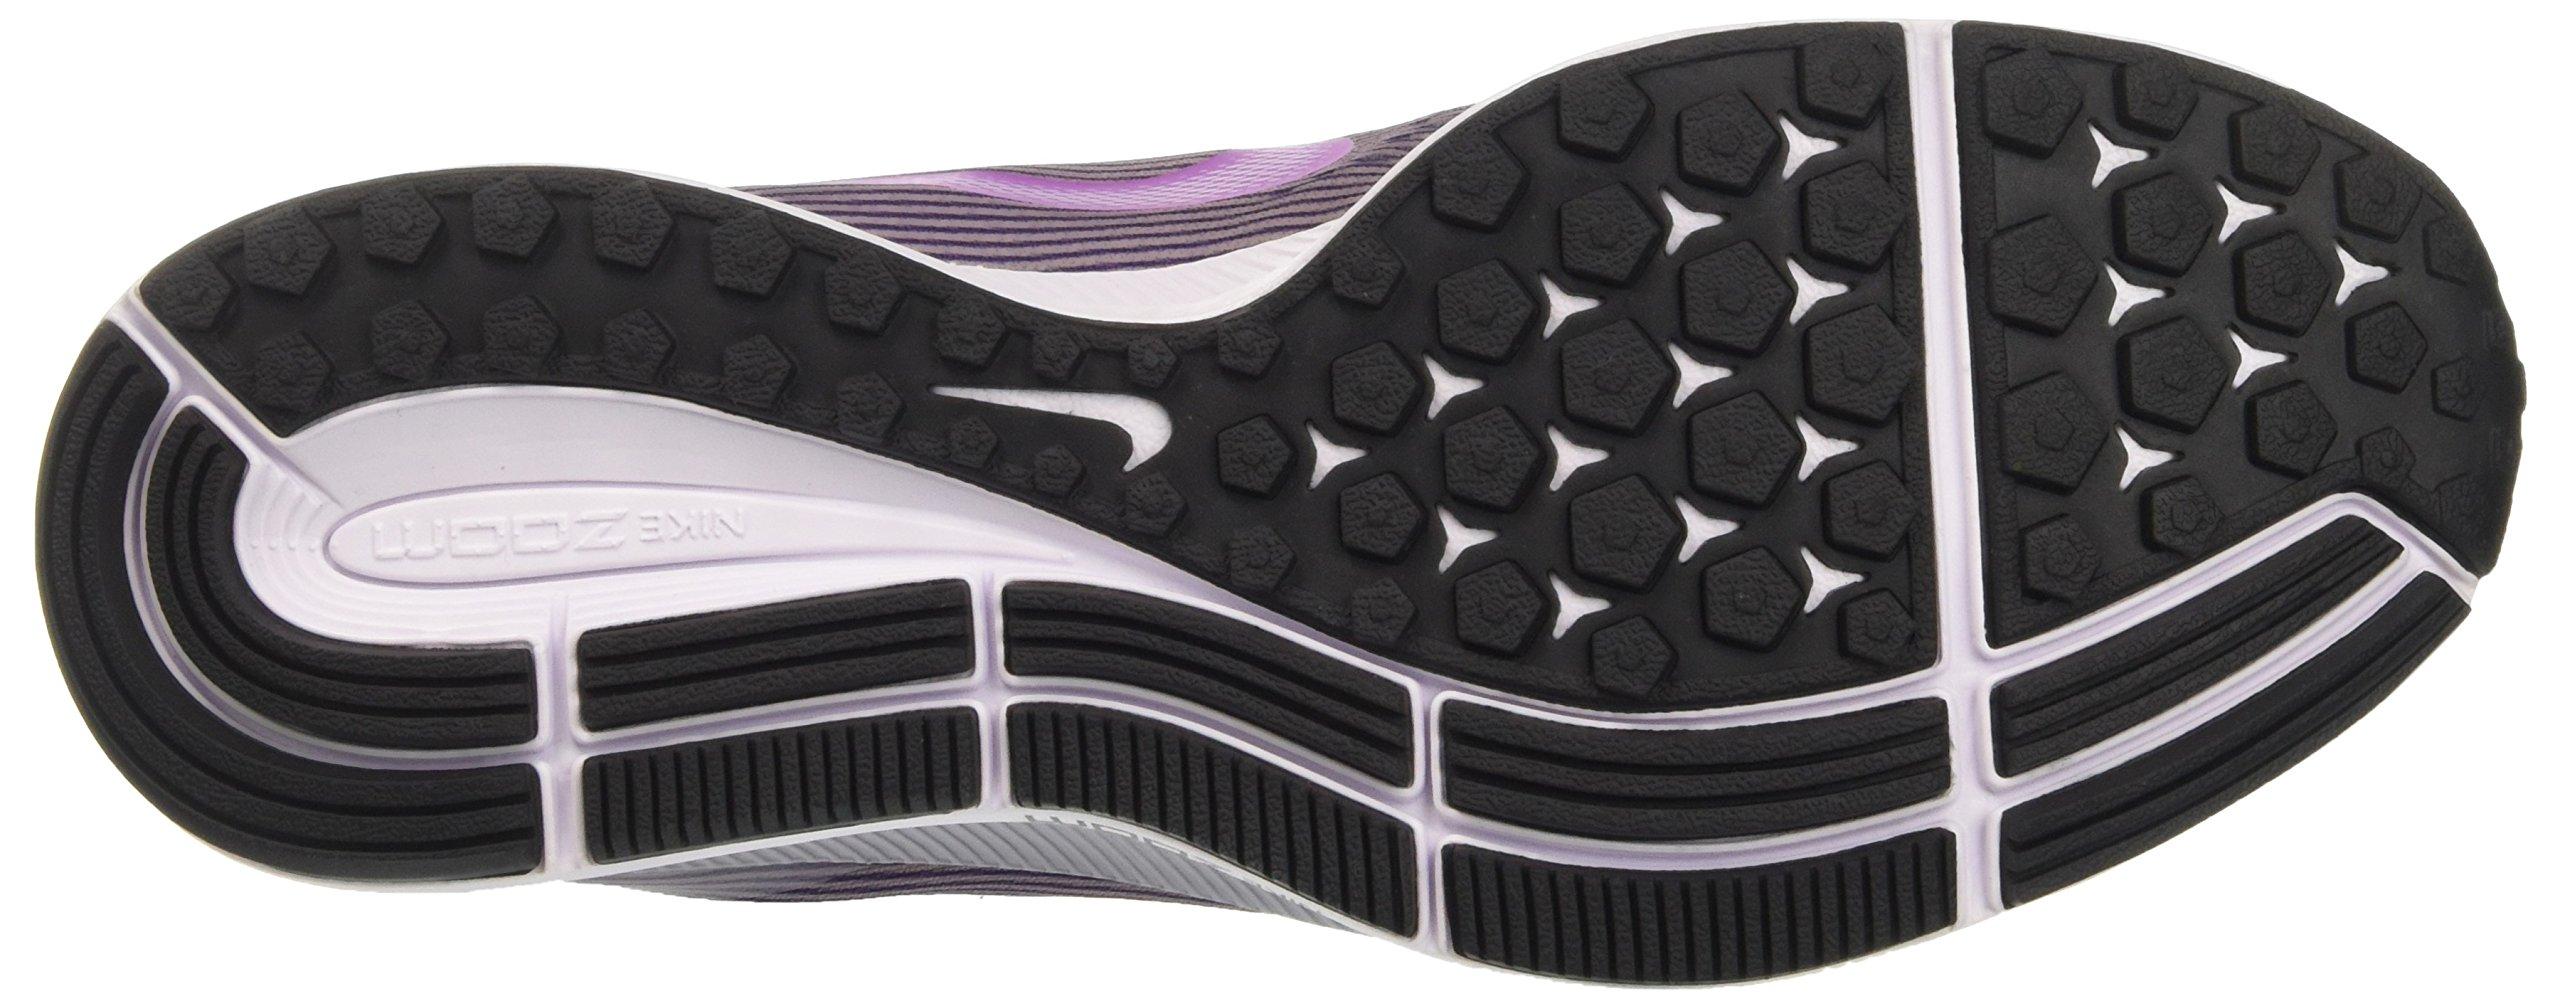 Nike Women's Air Zoom Pegasus 34 Running Shoes-Ink/Hyper Violet-6 by Nike (Image #3)